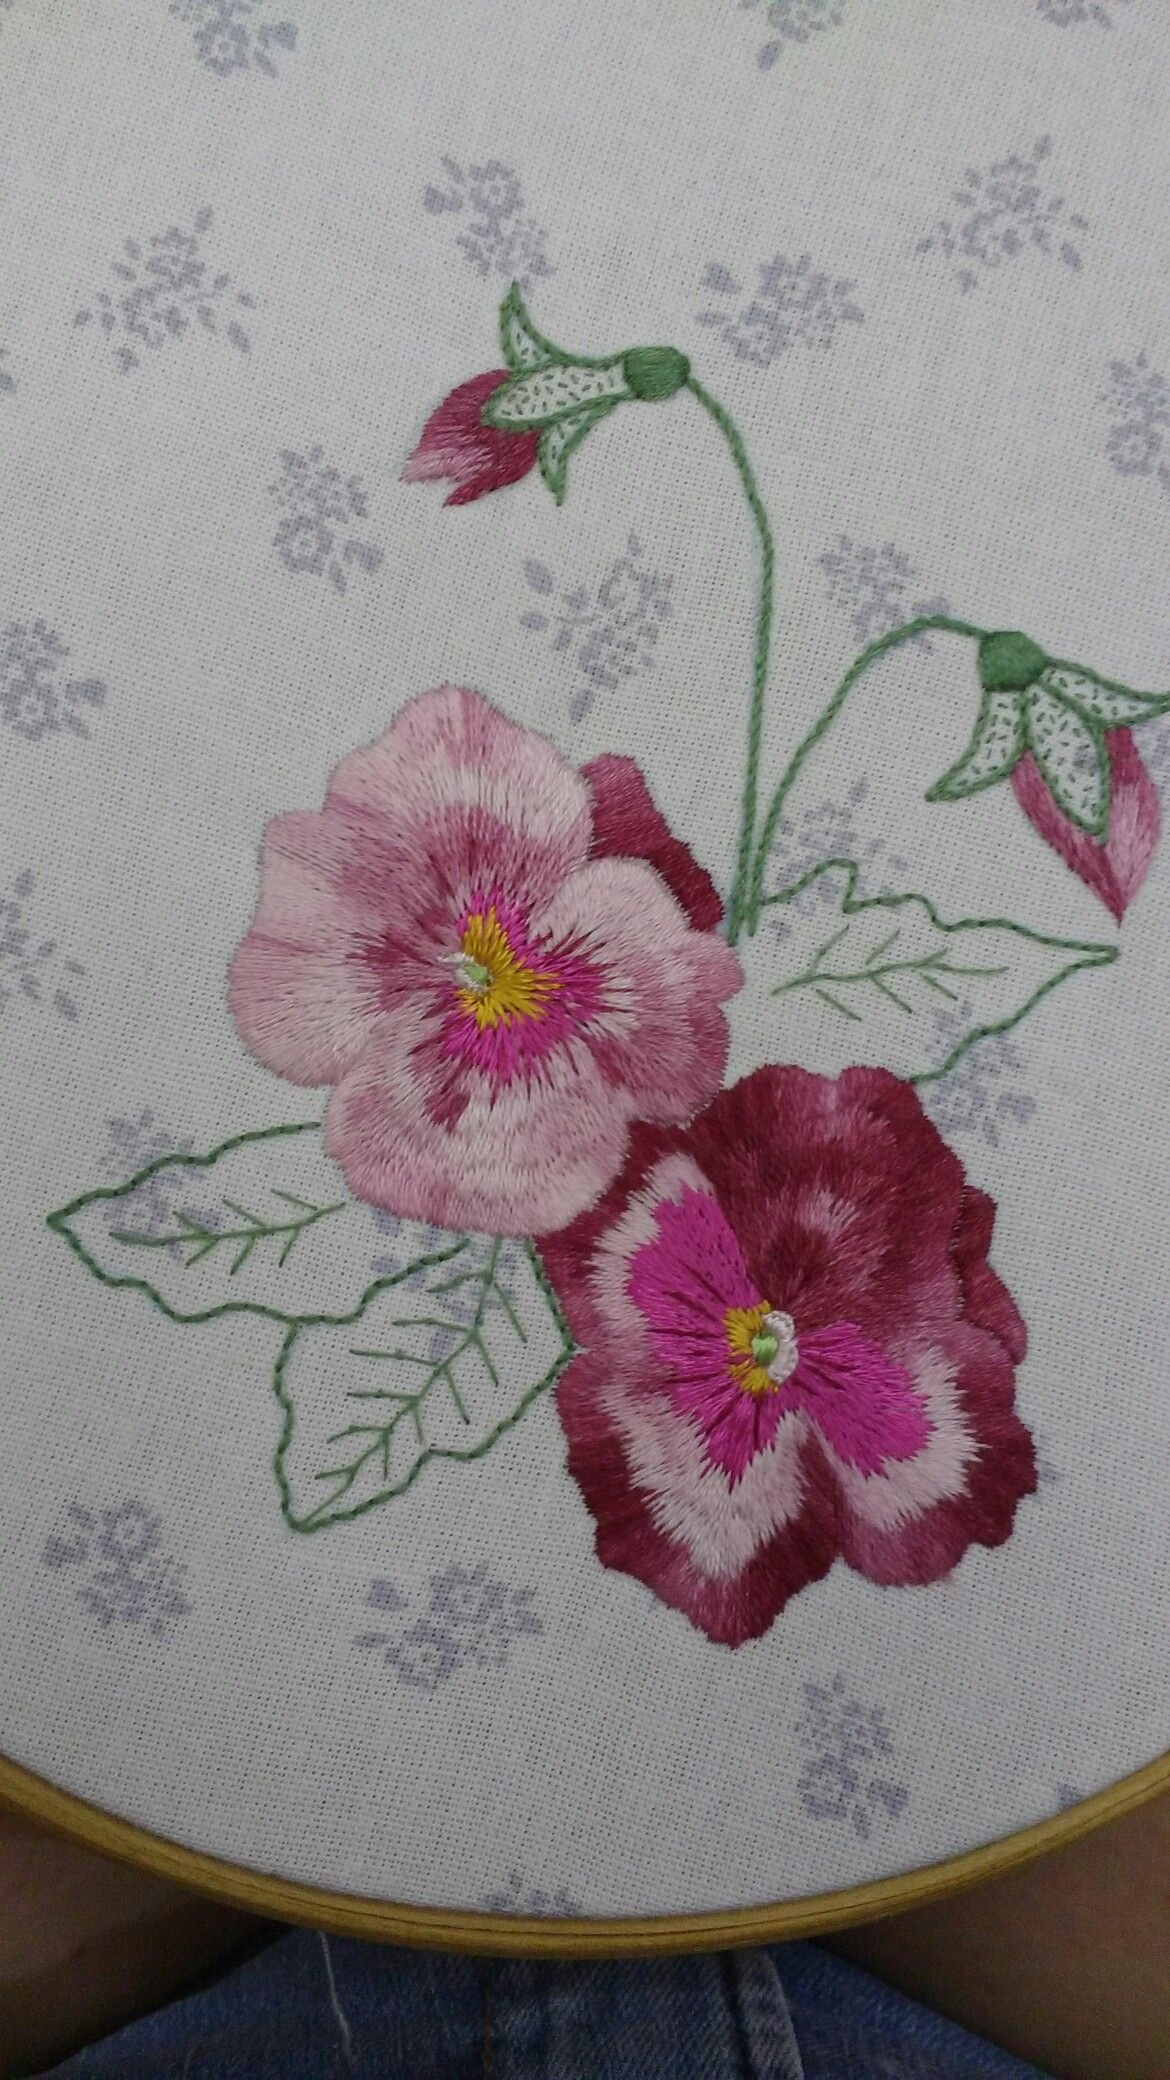 Pin by ام عبدالرحمن on تطريز pinterest embroidery needlework